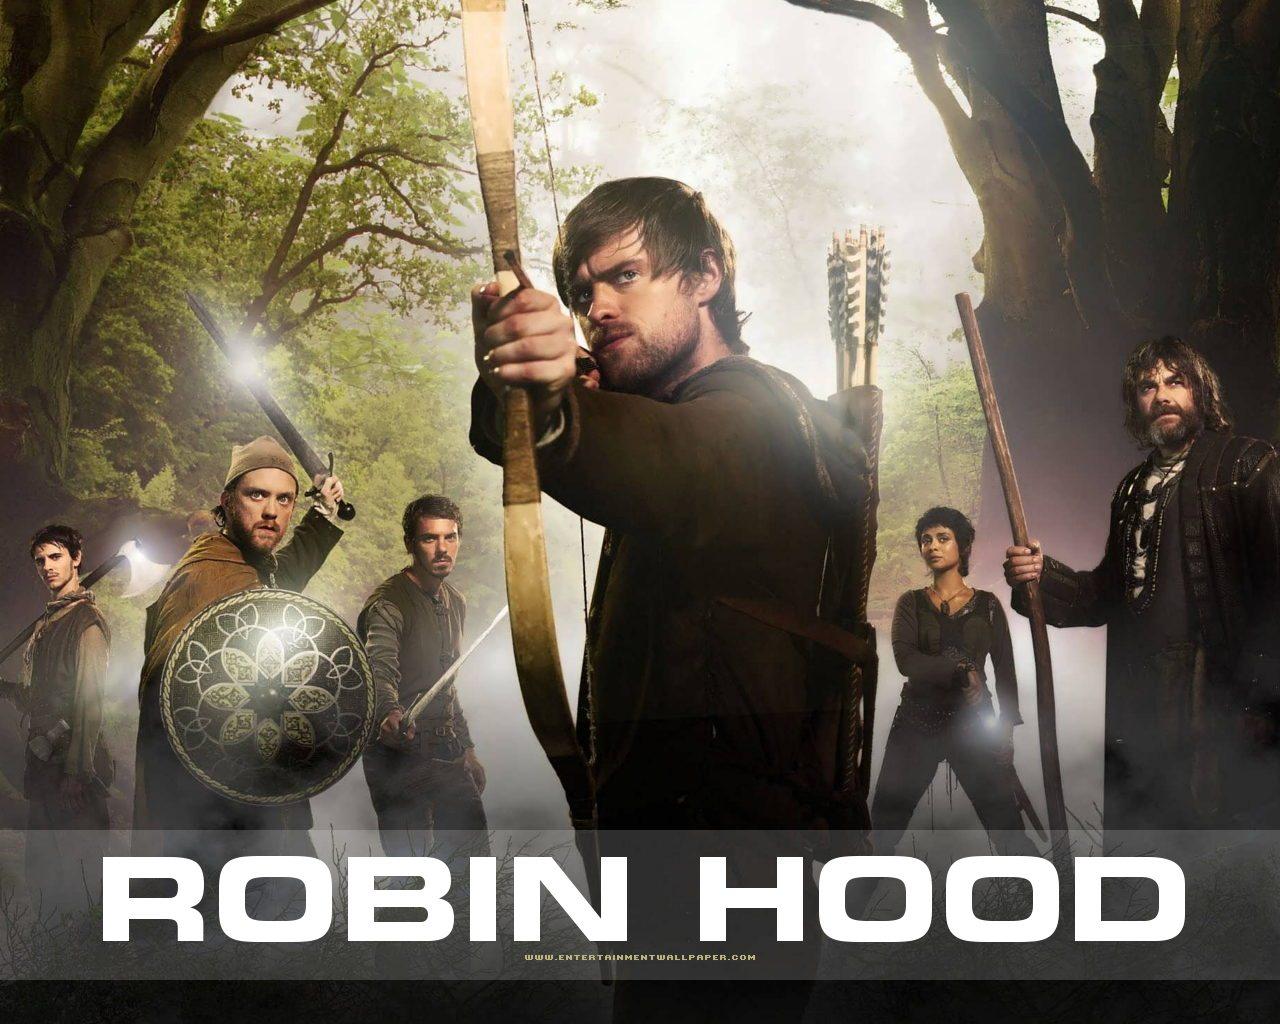 http://4.bp.blogspot.com/_StVZjwGghRk/TBCtrt1rxoI/AAAAAAAAFcQ/w6F7fv-hxgI/s1600/Robin+hood.jpg